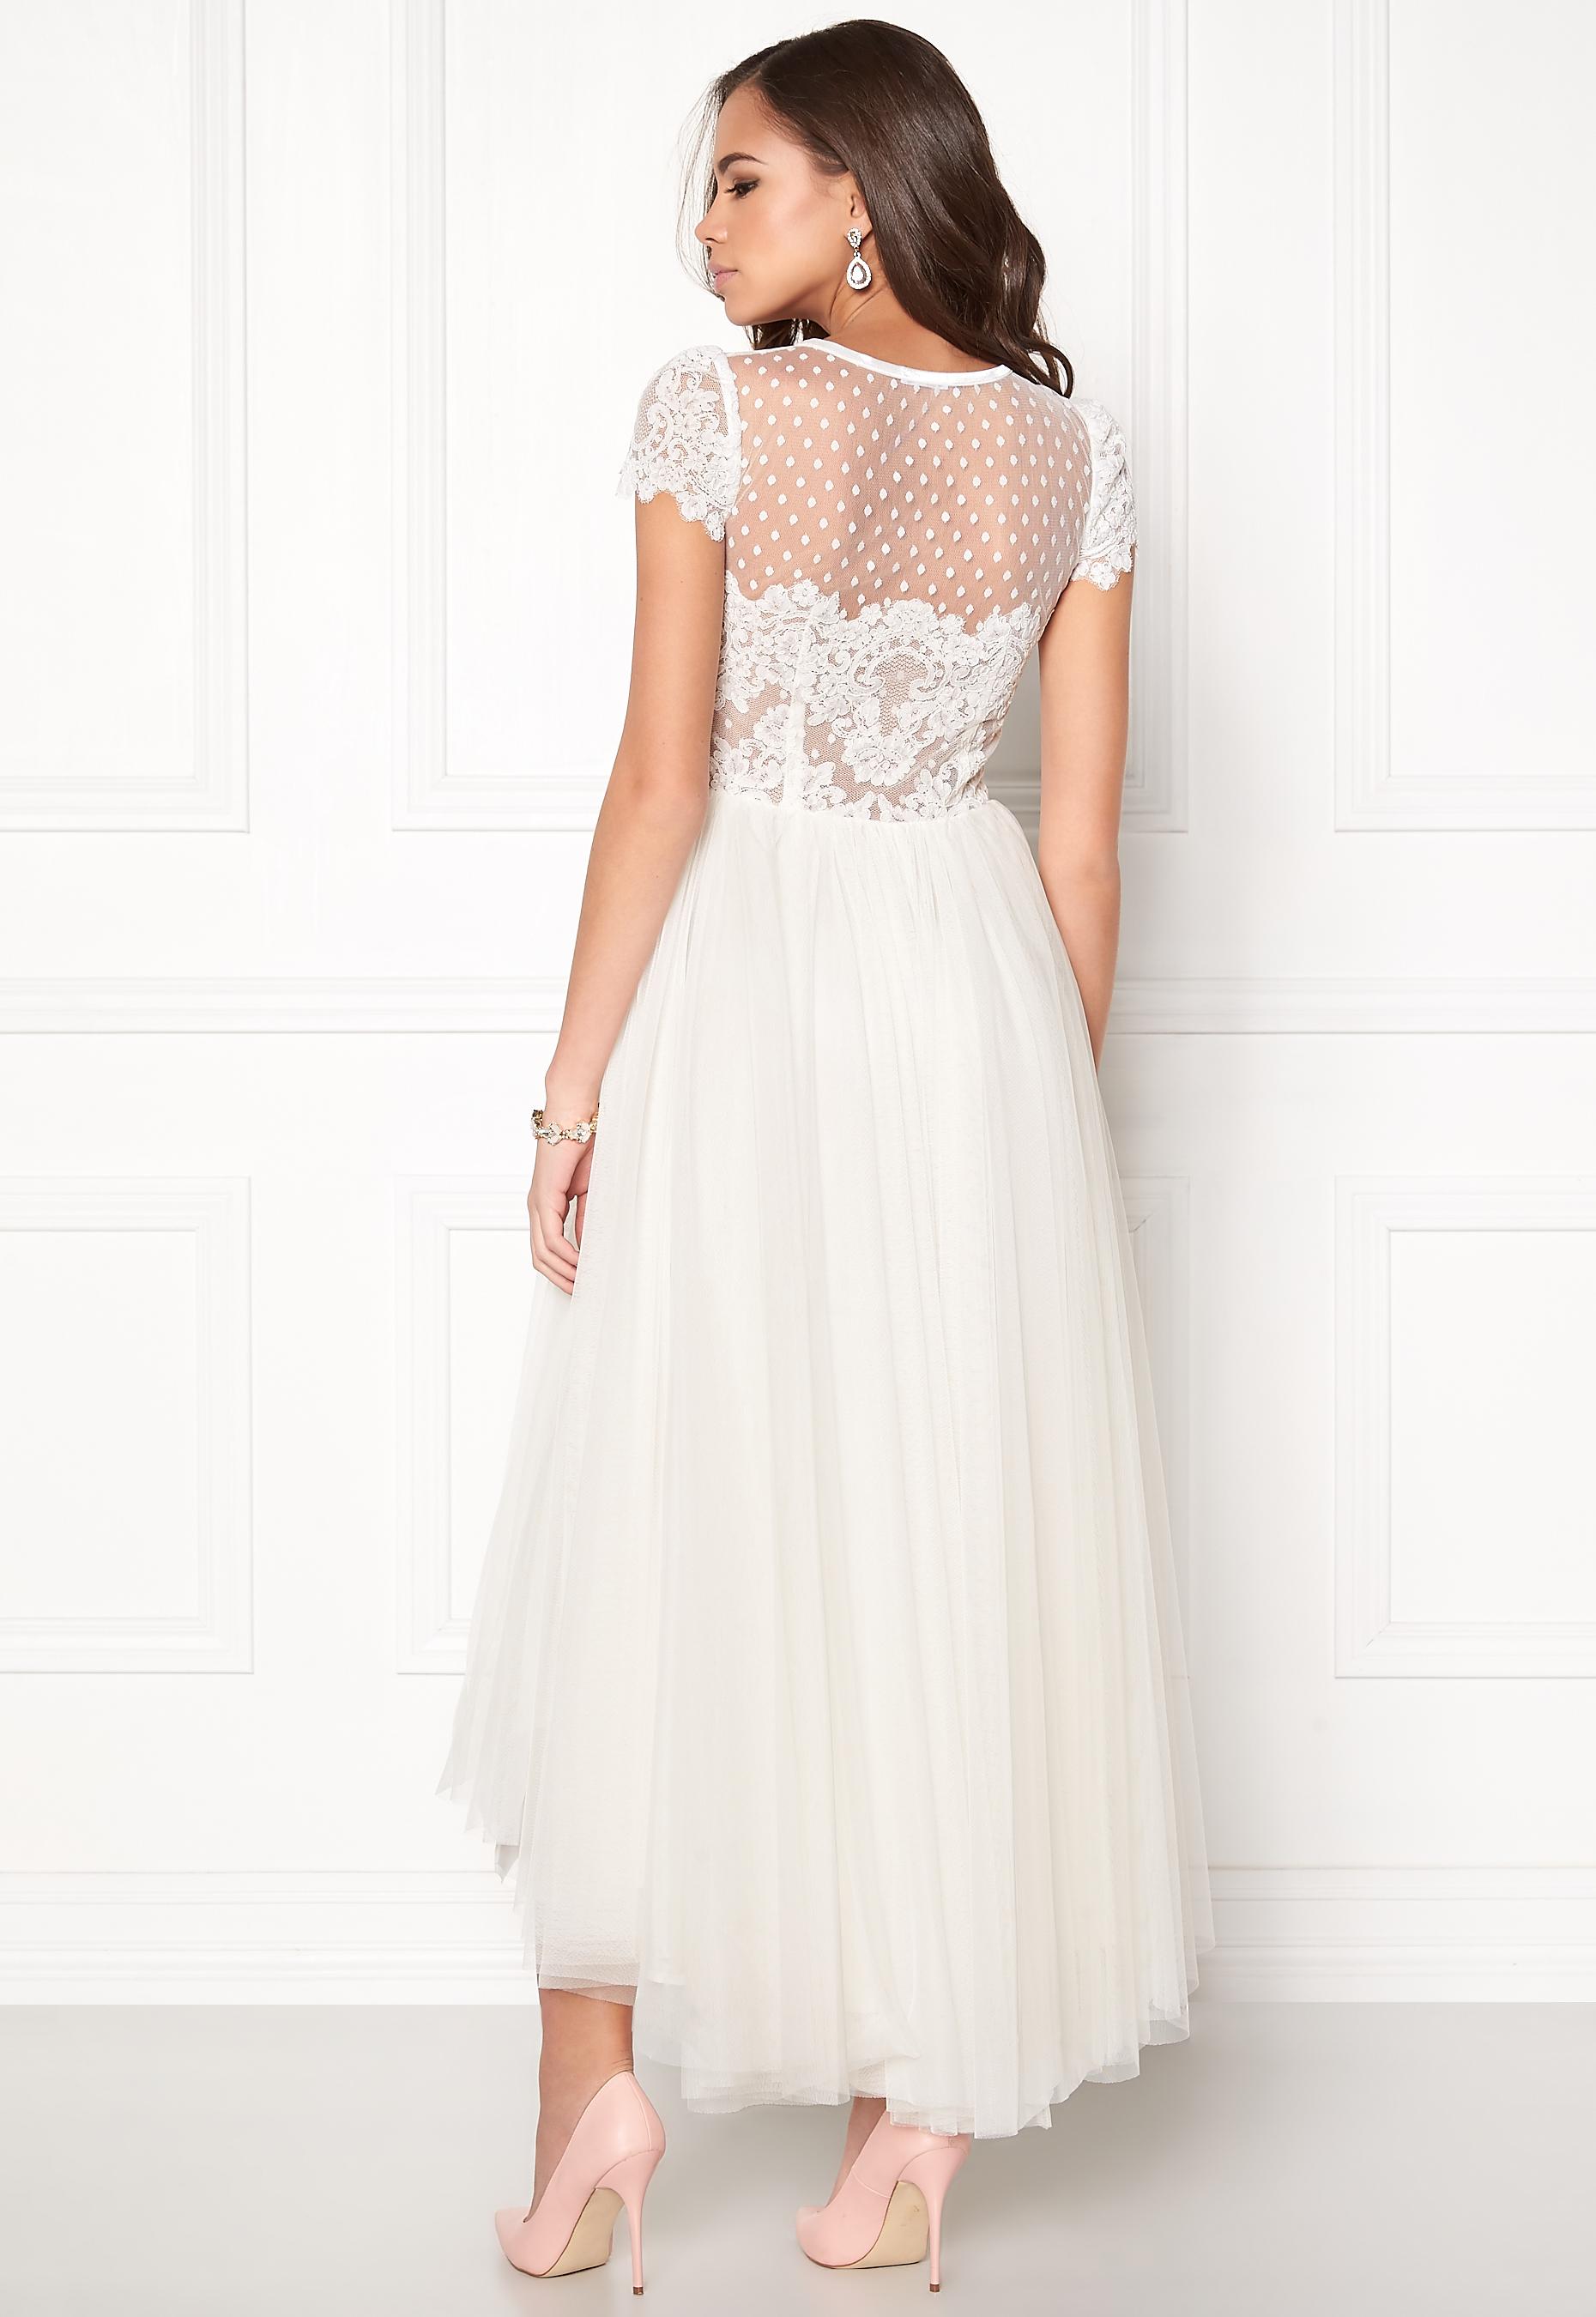 Ida Sjöstedt Caress Dress Ivory - Bubbleroom 6105a093d02f6